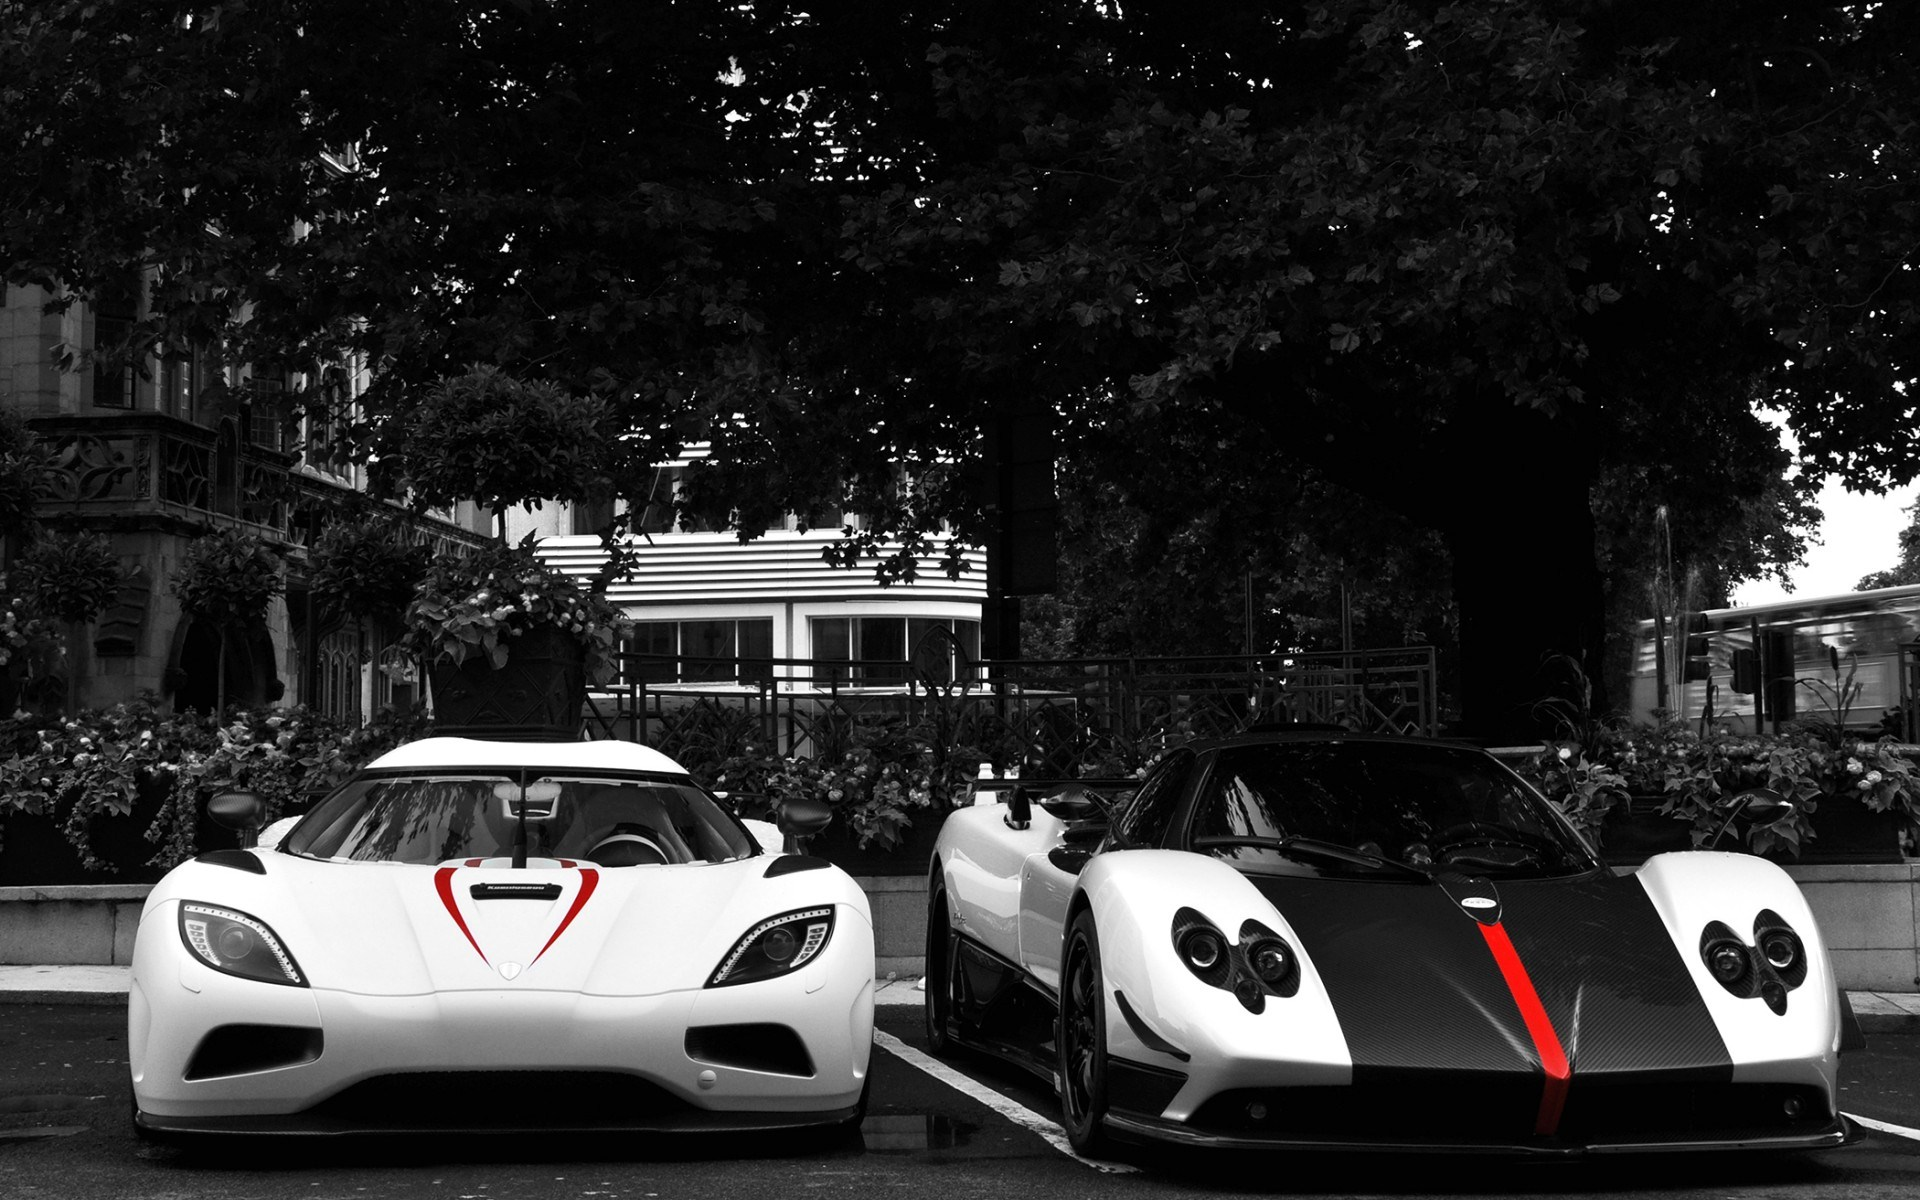 Exotic Cars Hd Wallpapers: Pagani Zonda Koenigsegg Agera R Luxury Exotic Cars